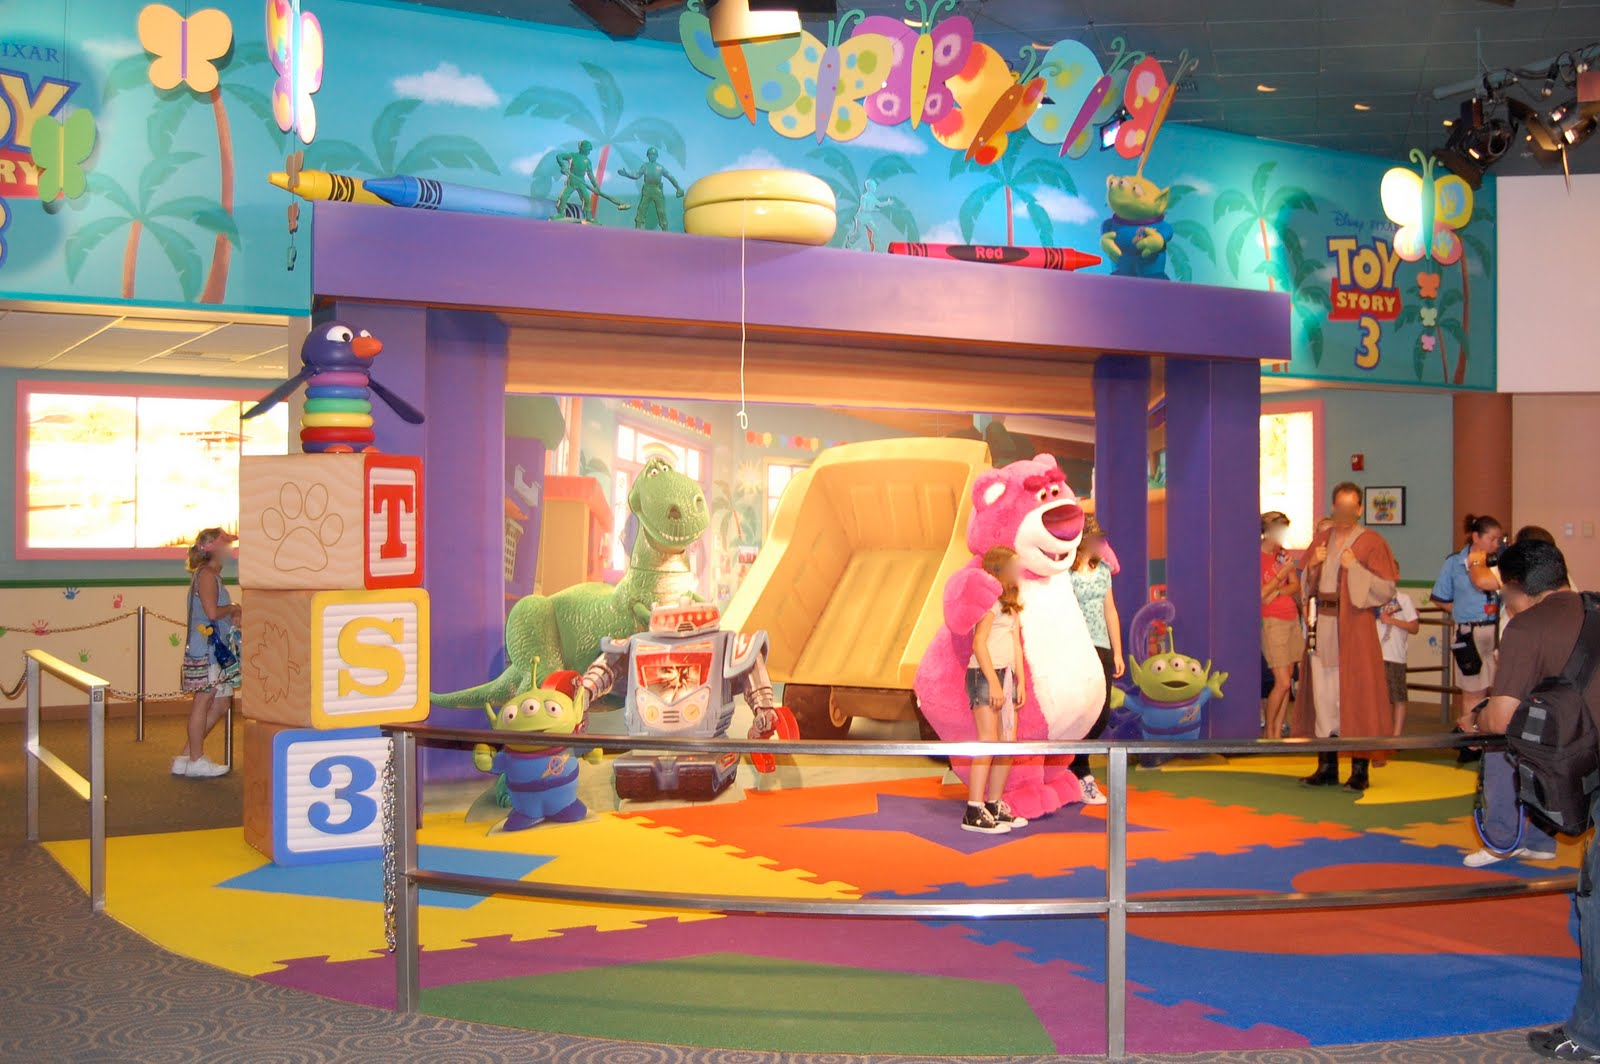 Disneyshawn Meet Lotso